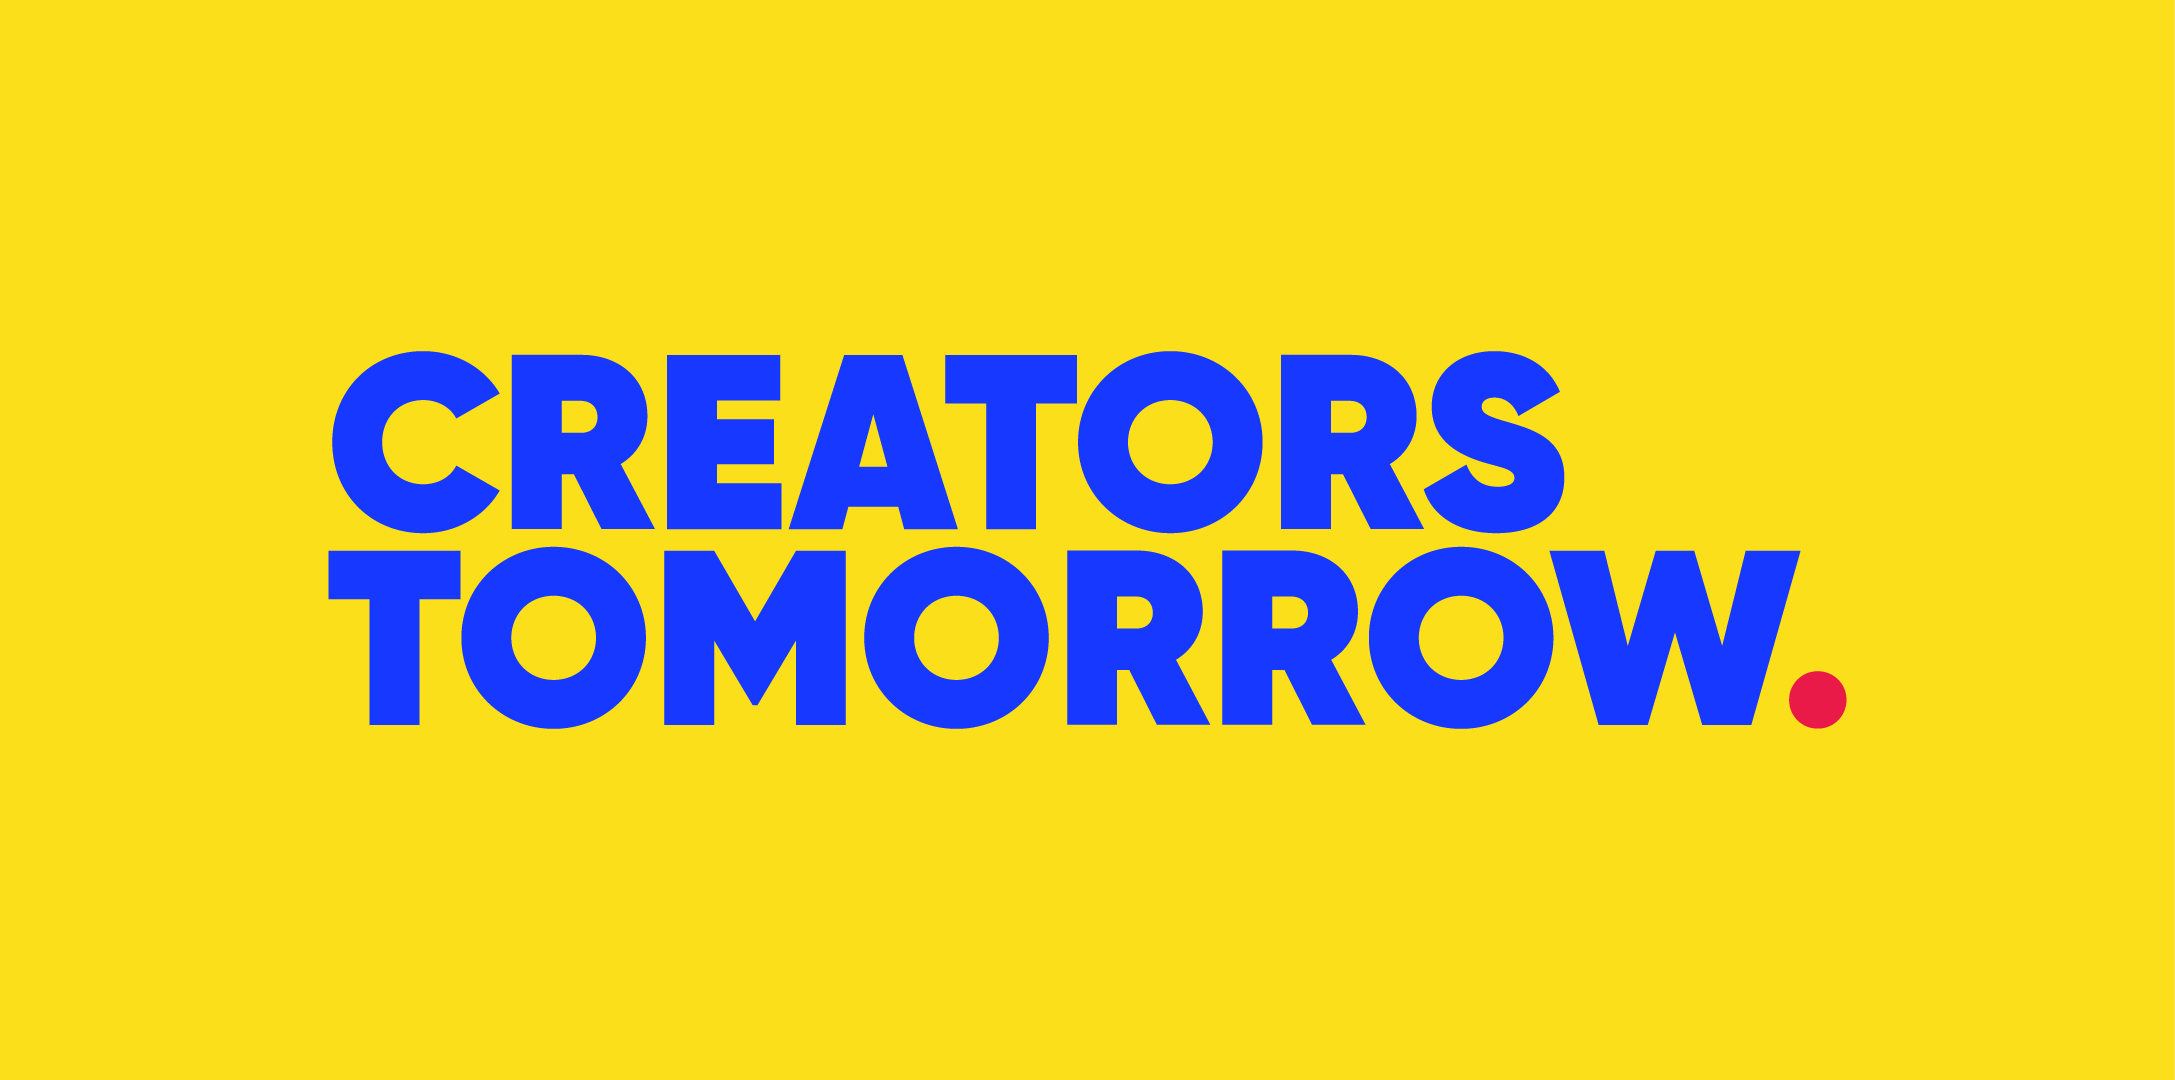 Creators tomorrow.